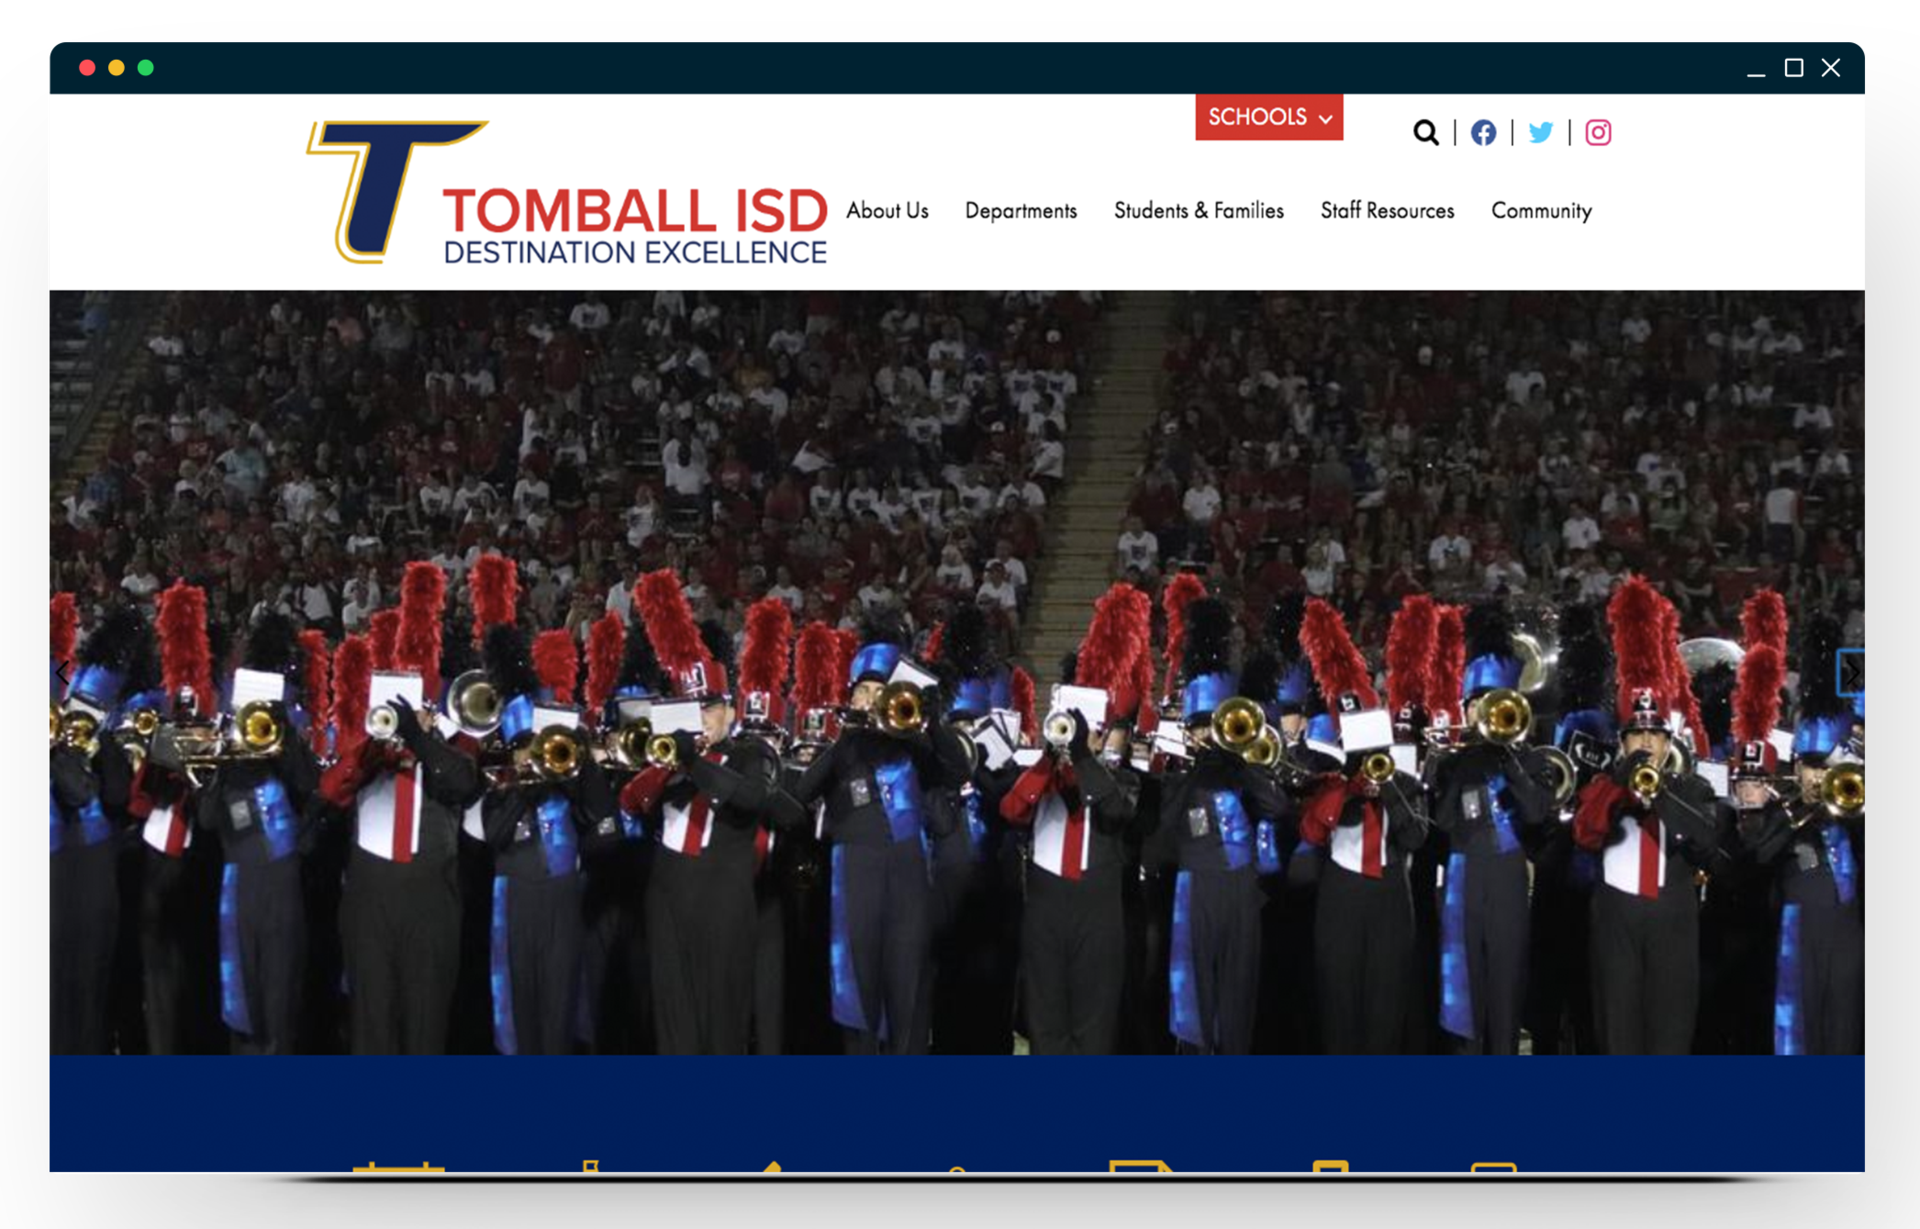 Tomball ISD Homepage